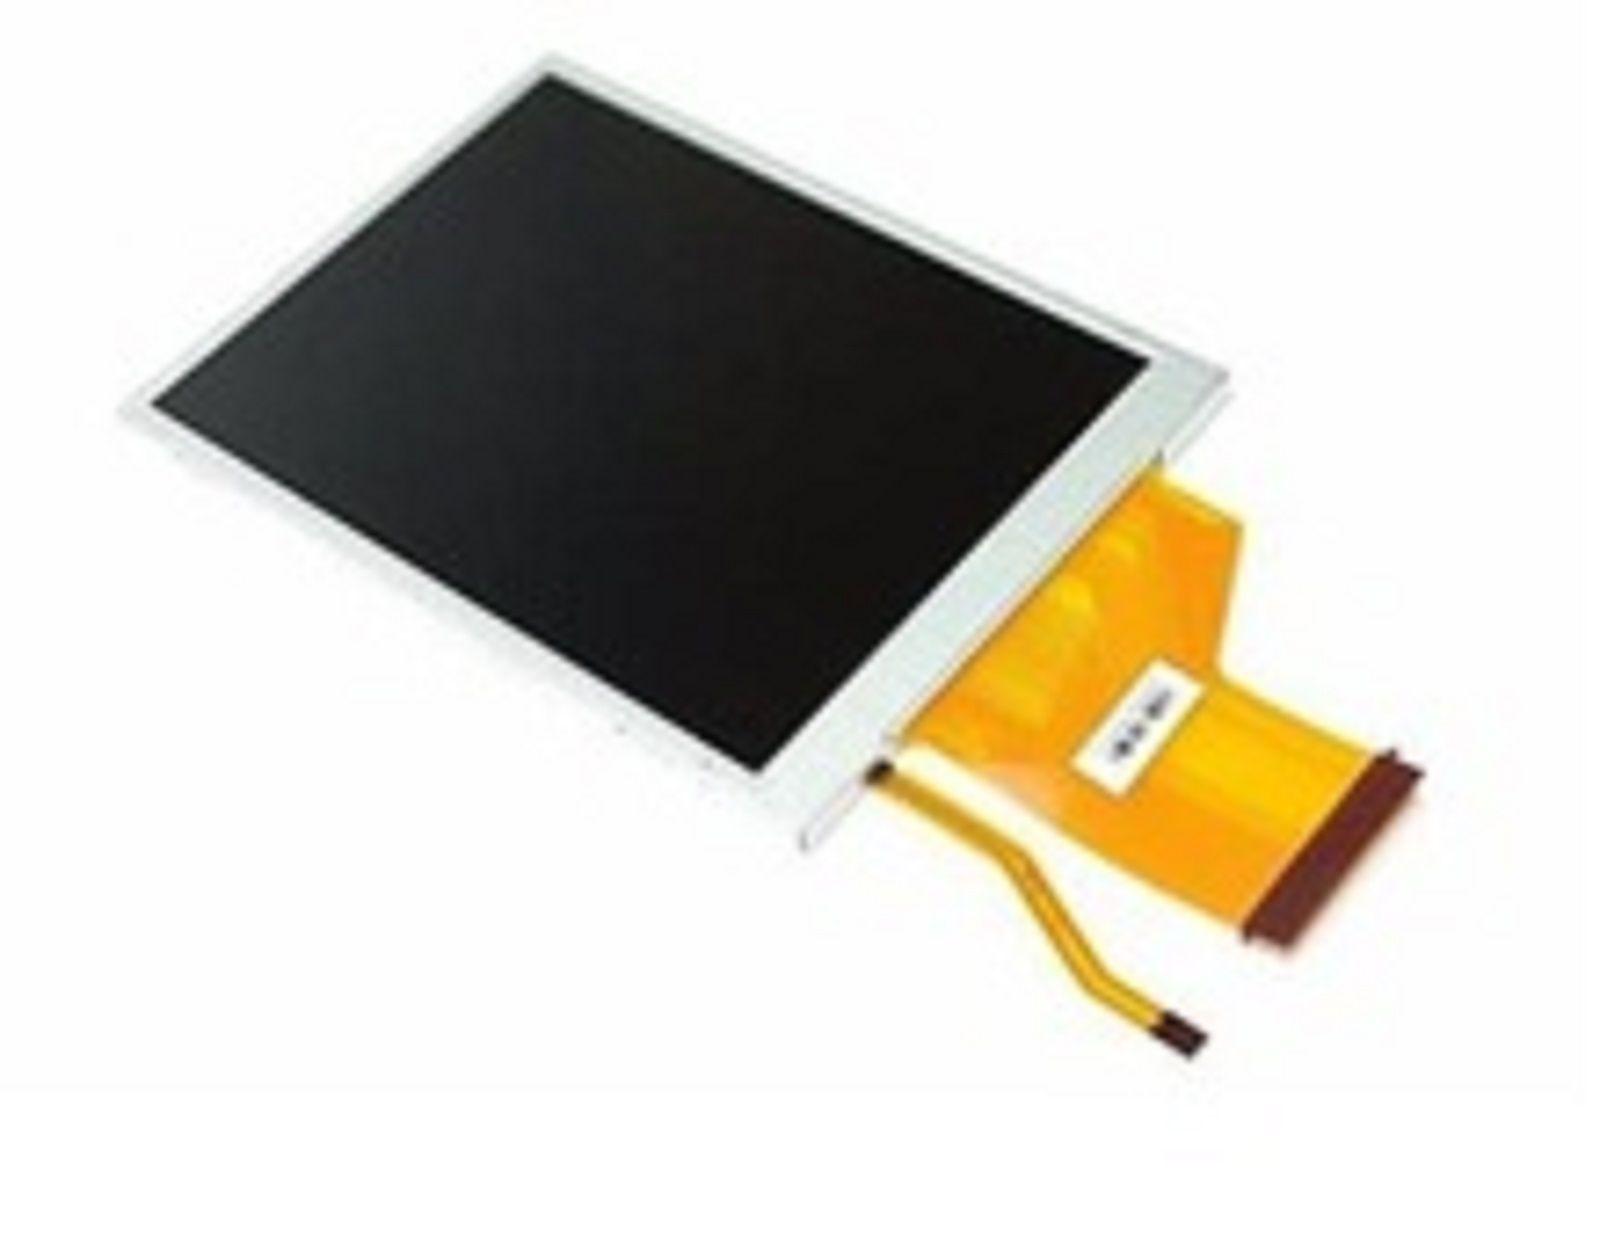 Display Lcd  para Sony DSC-HX50, DSC-HX300, HX50, HX300